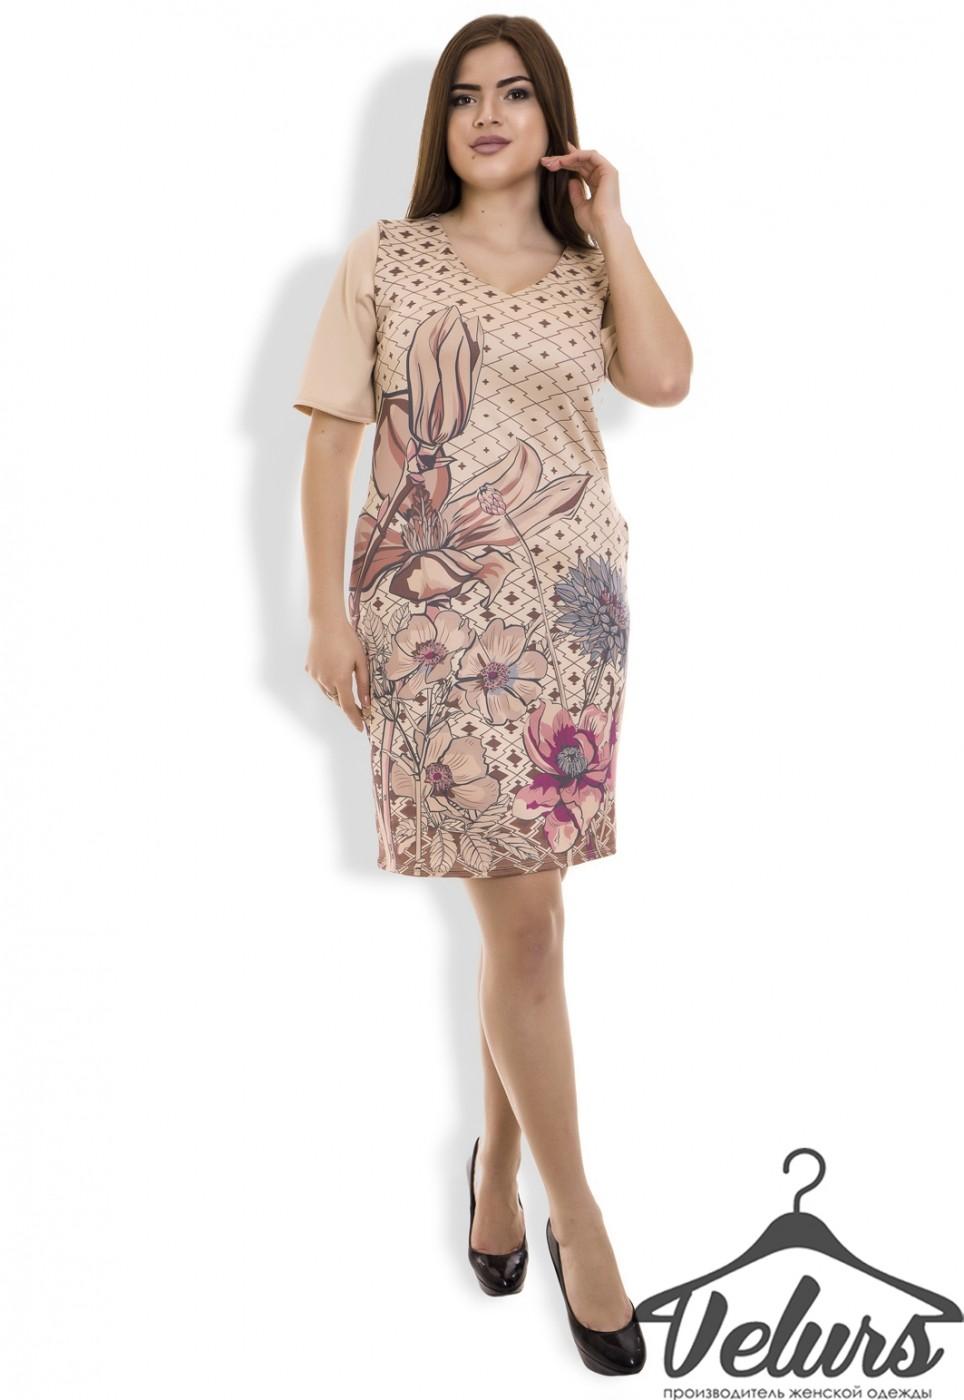 Velurs: Платье 212110 - фото 19